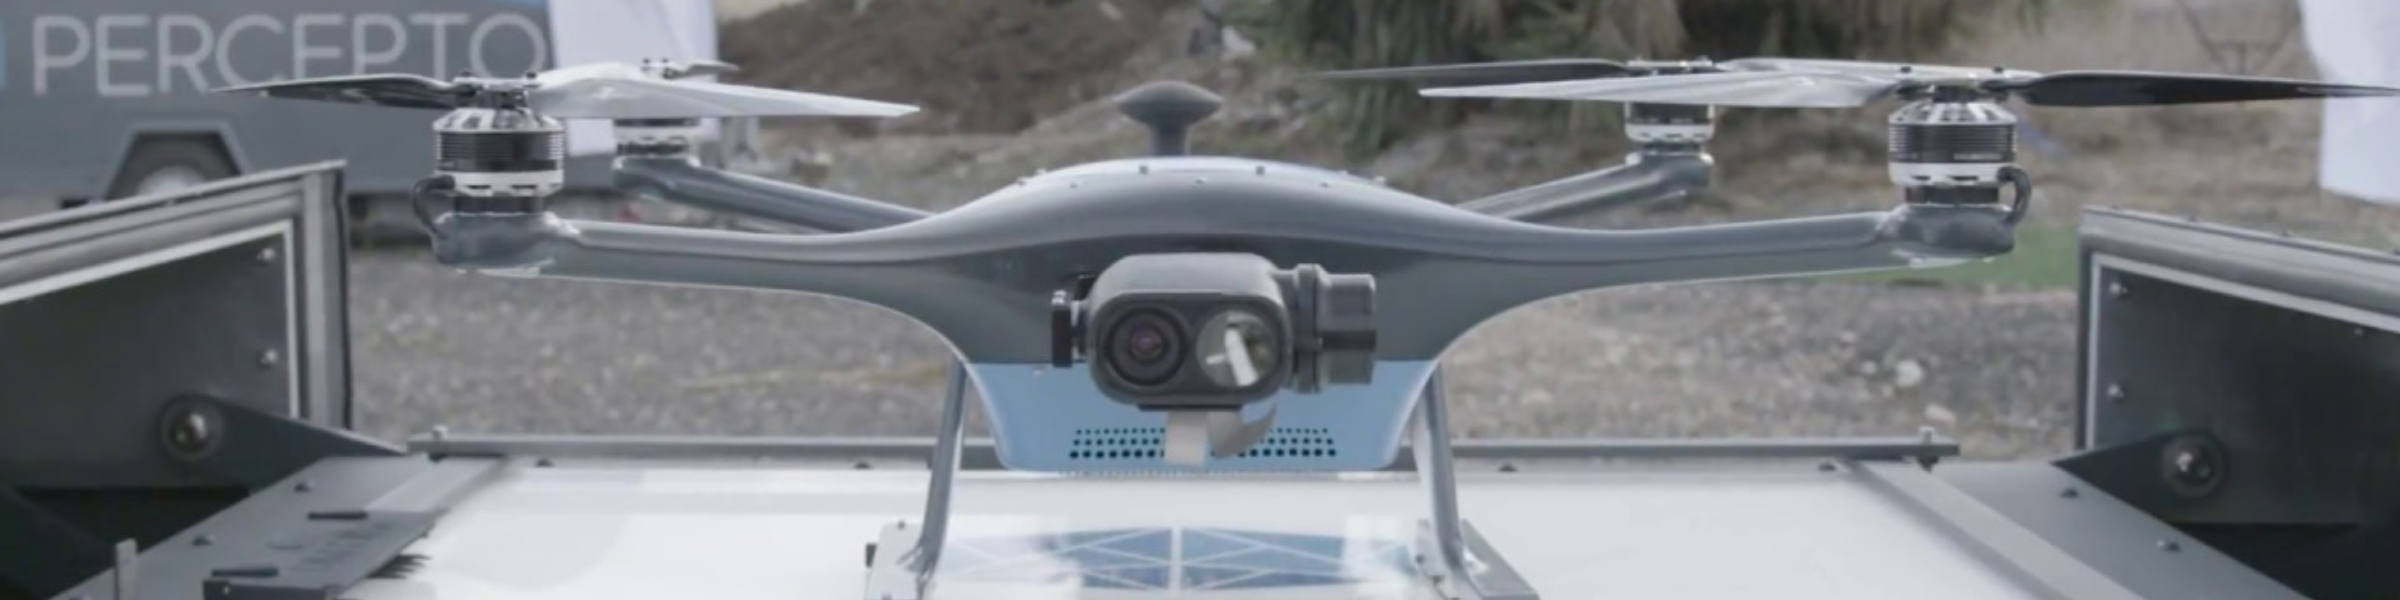 Percepto_Drone Major